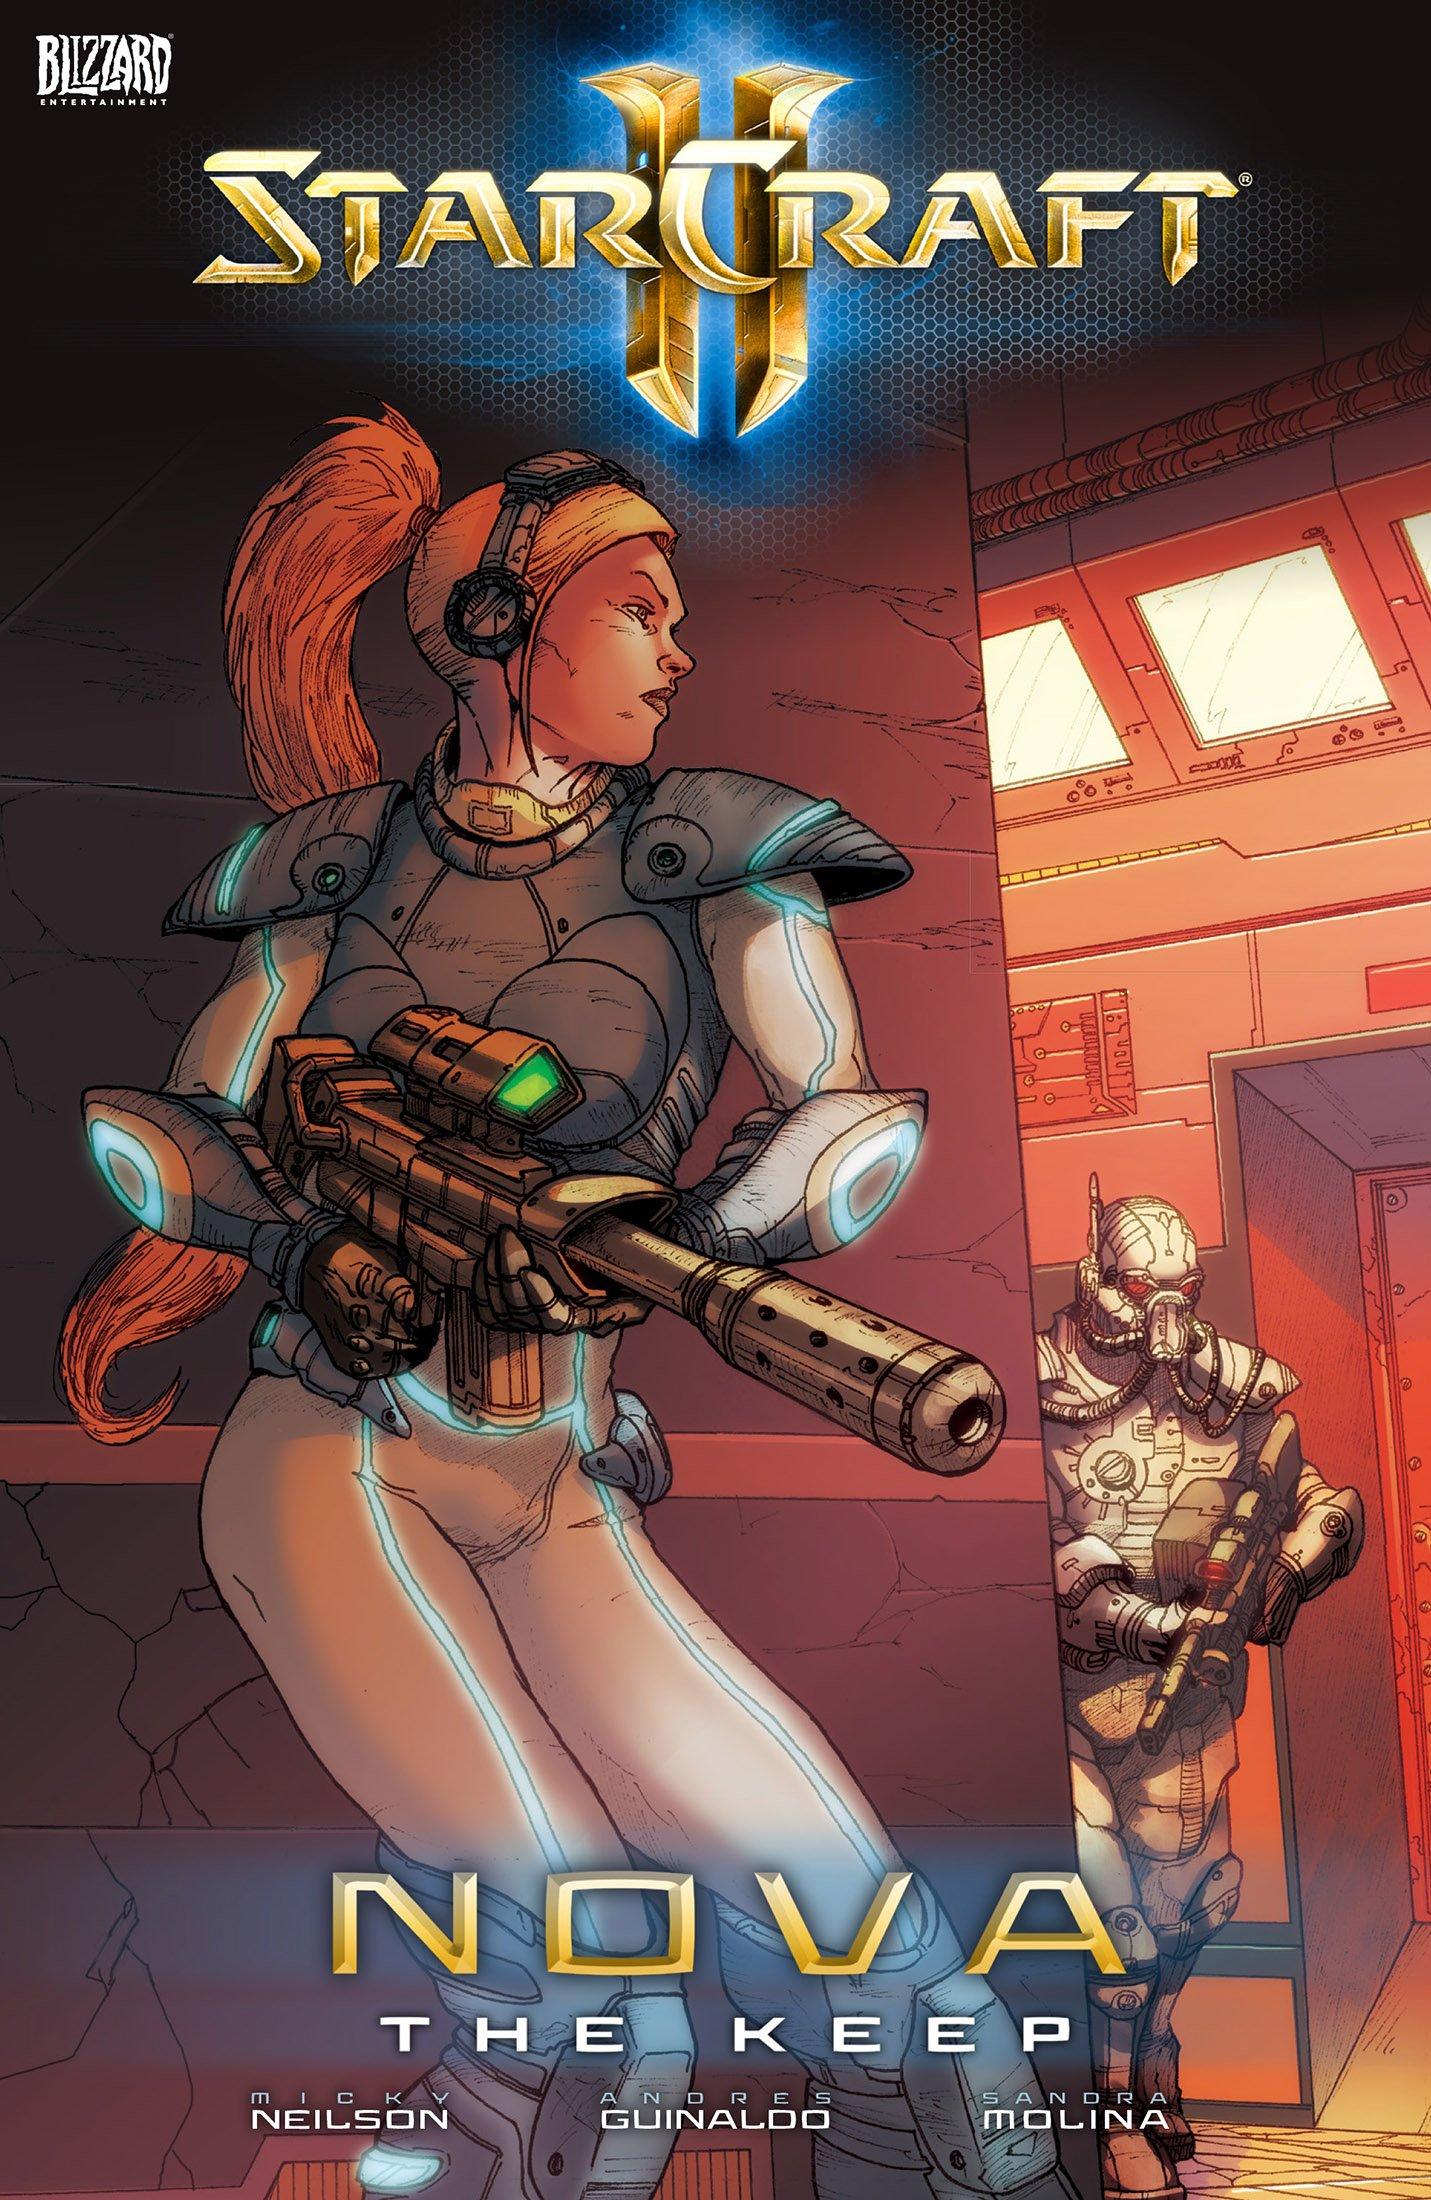 StarCraft II - Nova: The Keep (November 2016)